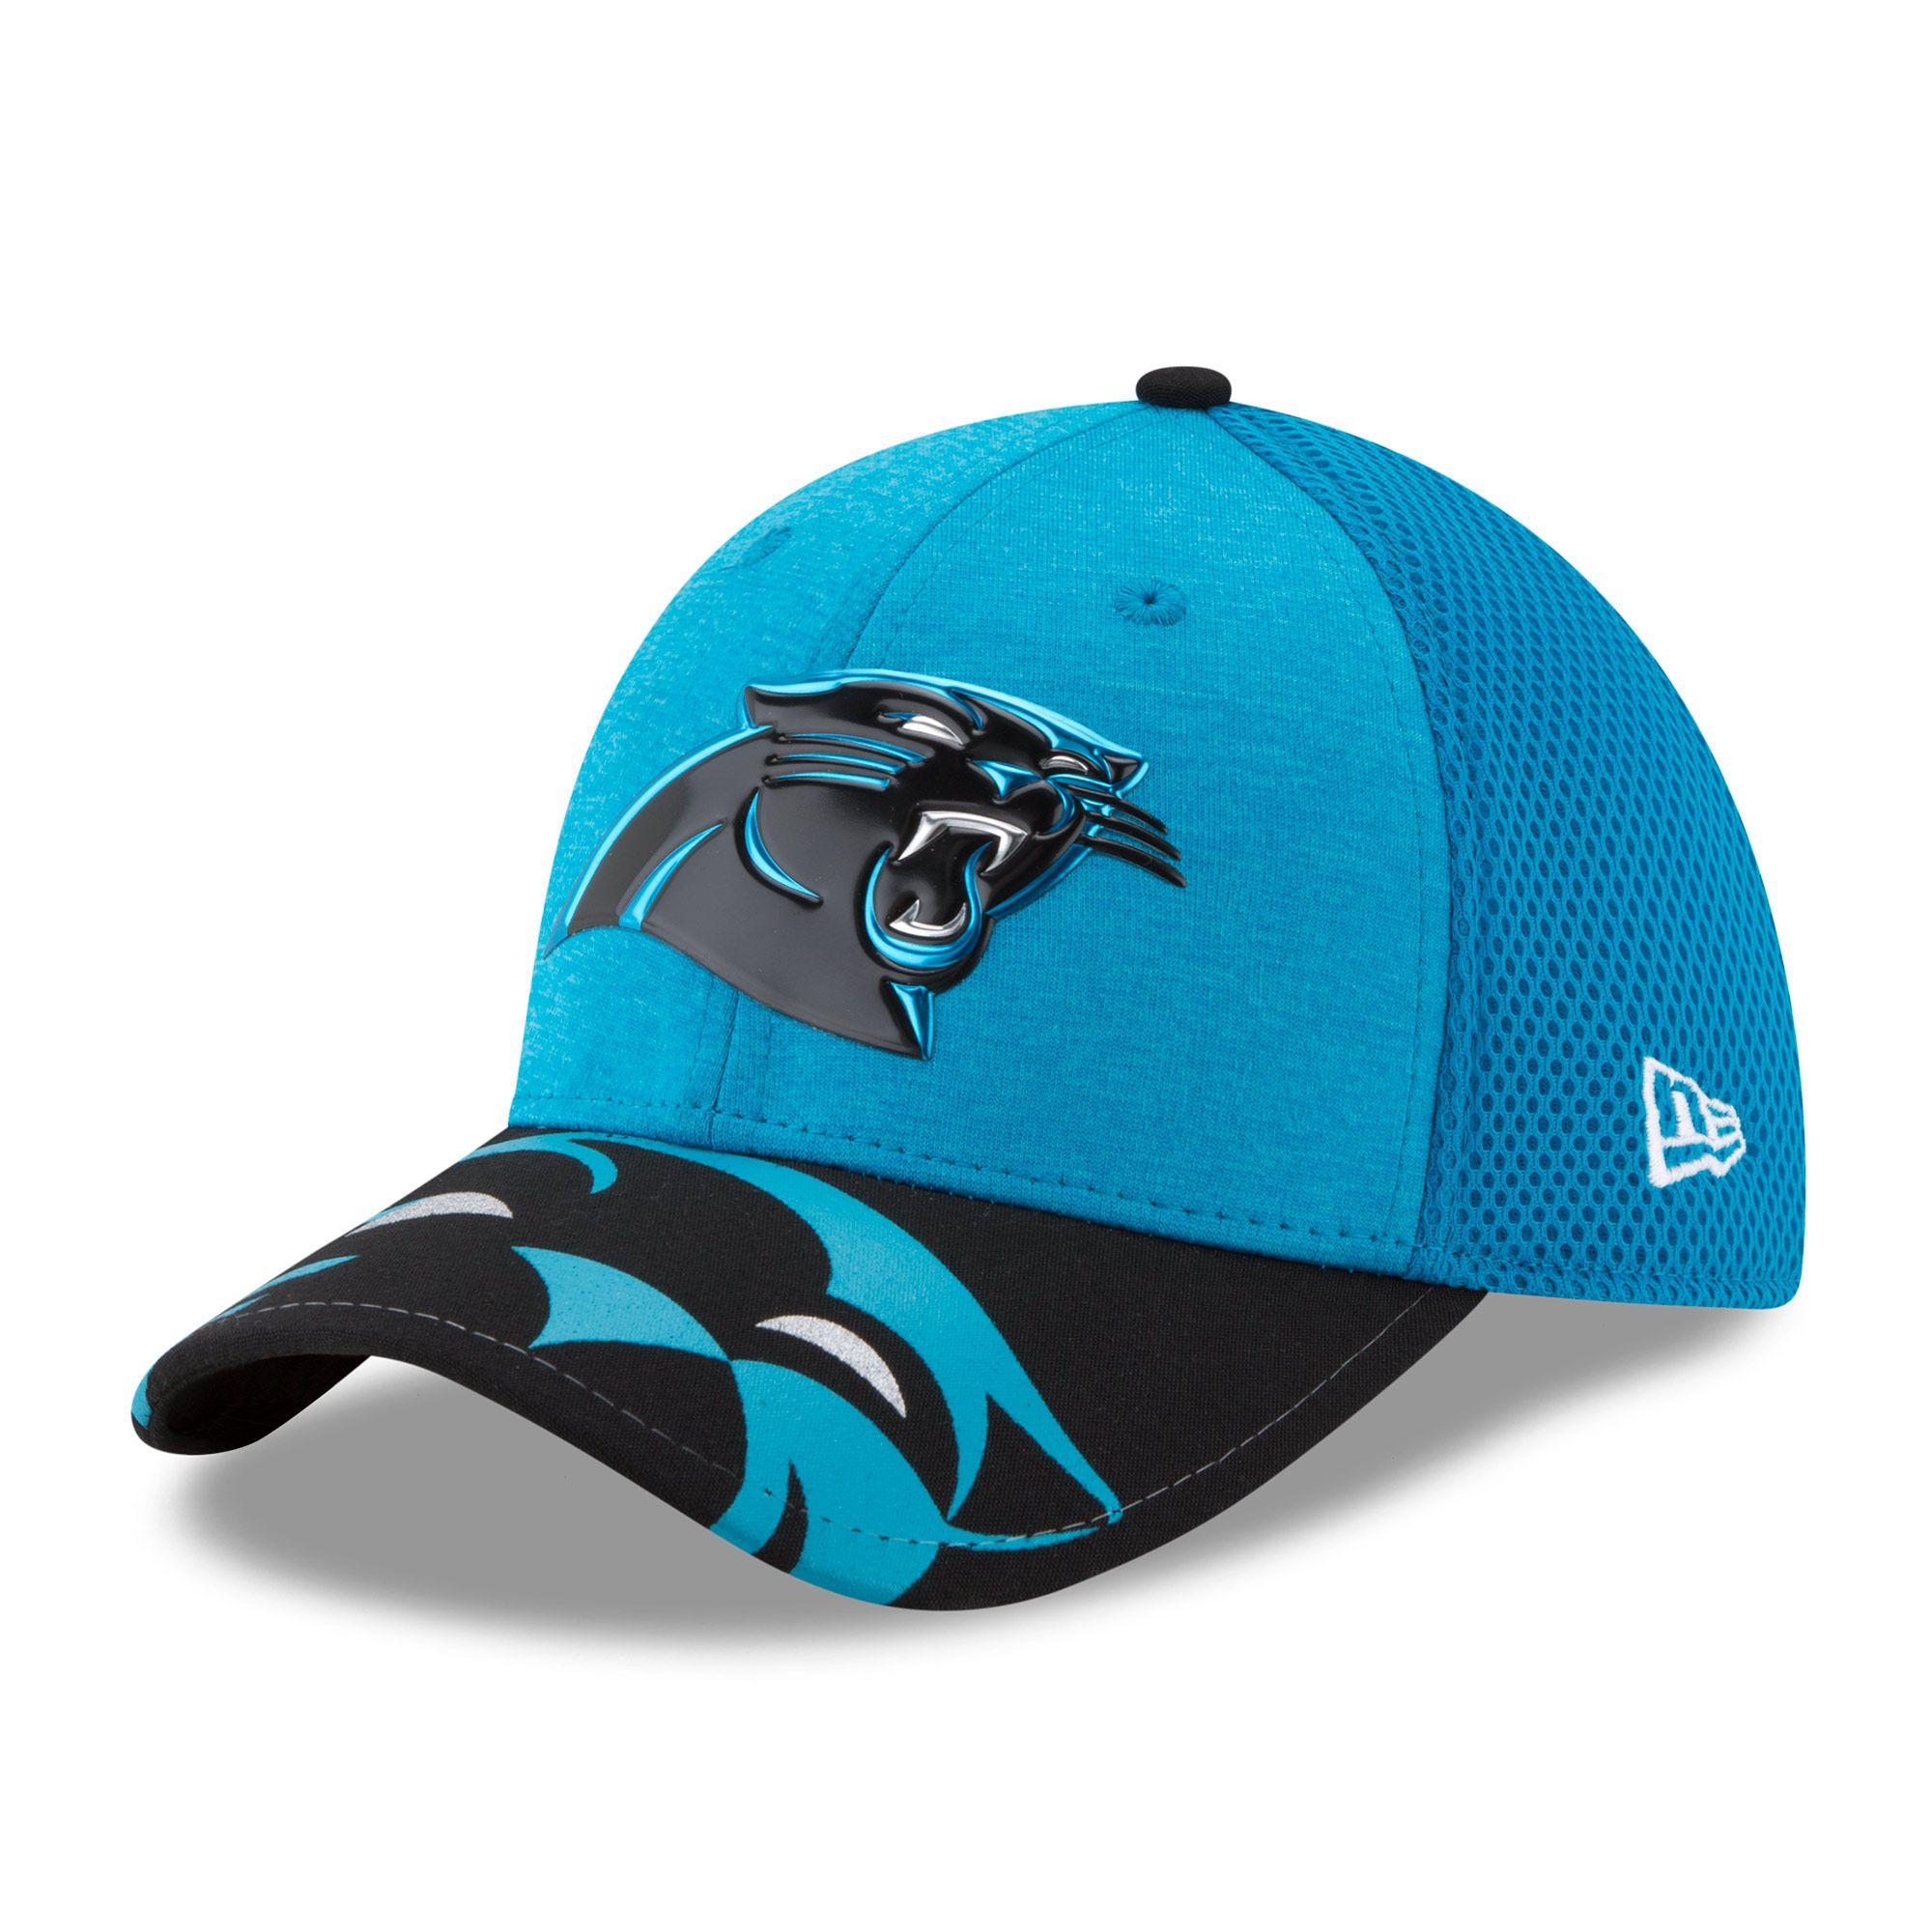 super popular 9e674 5b629 Carolina Panthers New Era 2017 NFL Draft On Stage 39THIRTY Flex Hat - Blue